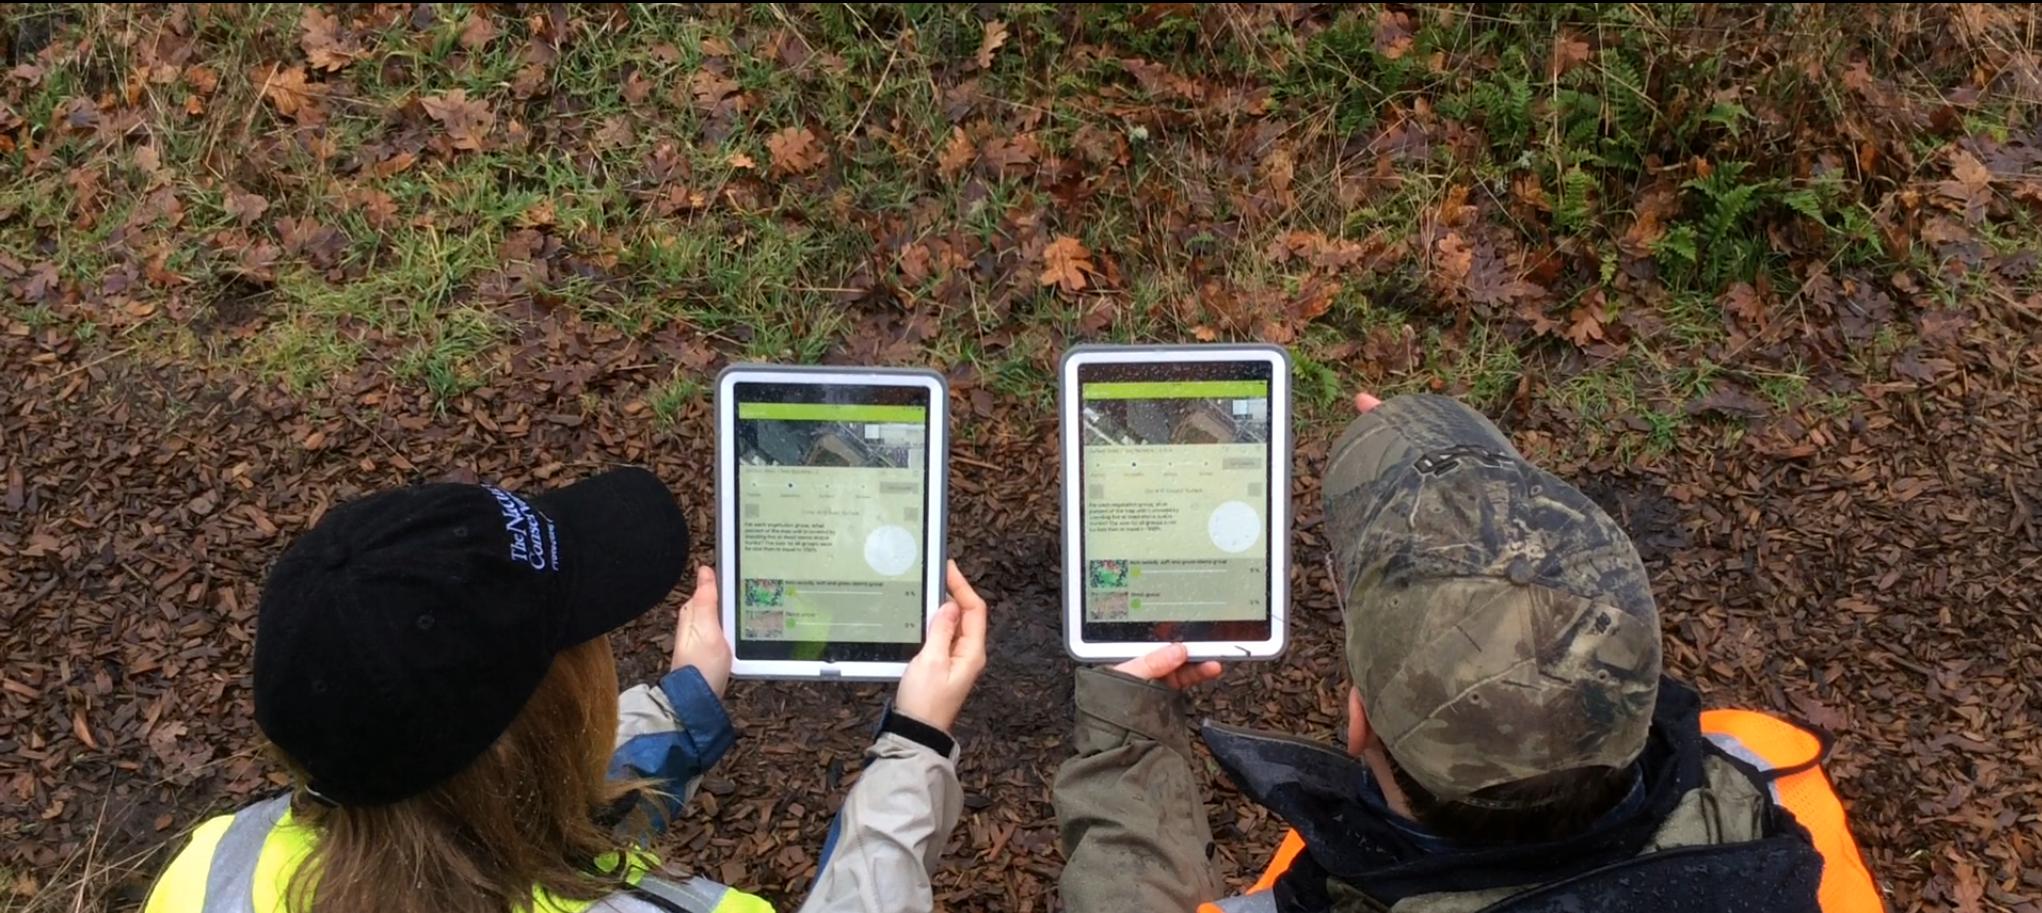 Meet the ESII Field App